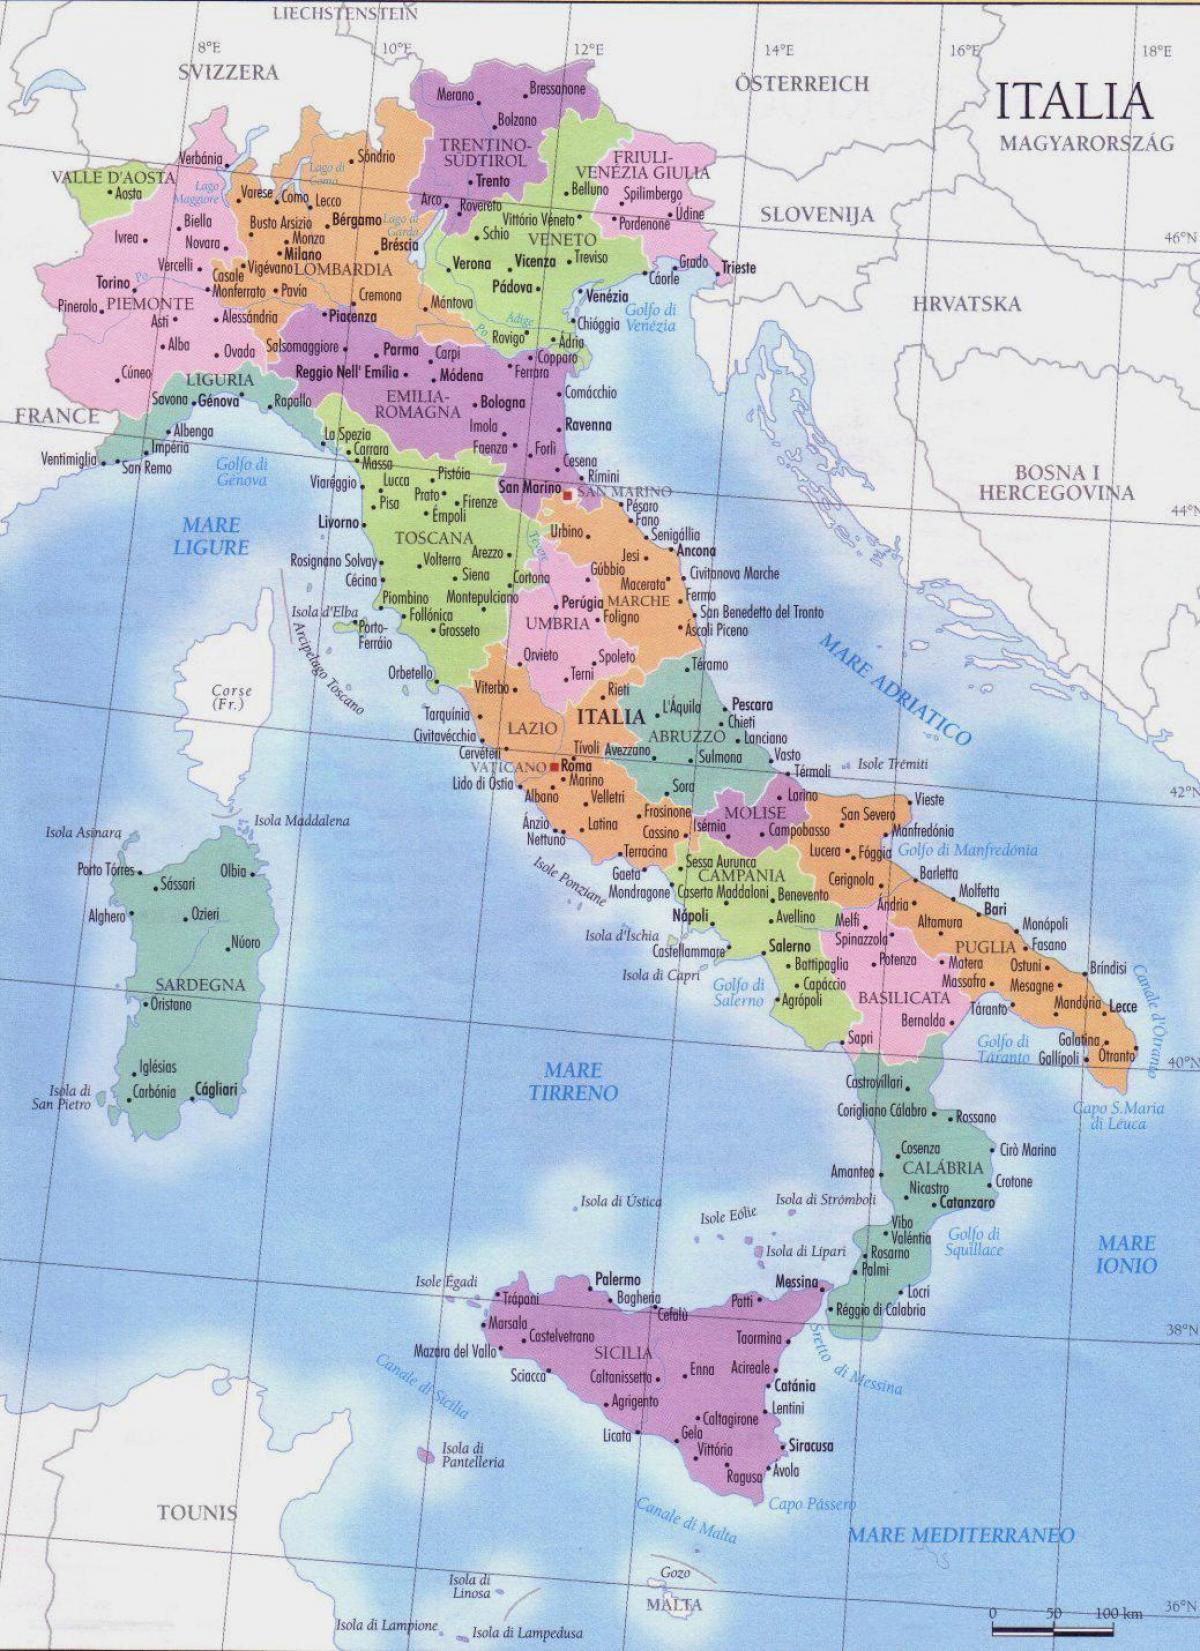 detaljert kart over italia Kart over Italia regioner   Detaljert kart over Italia regioner  detaljert kart over italia